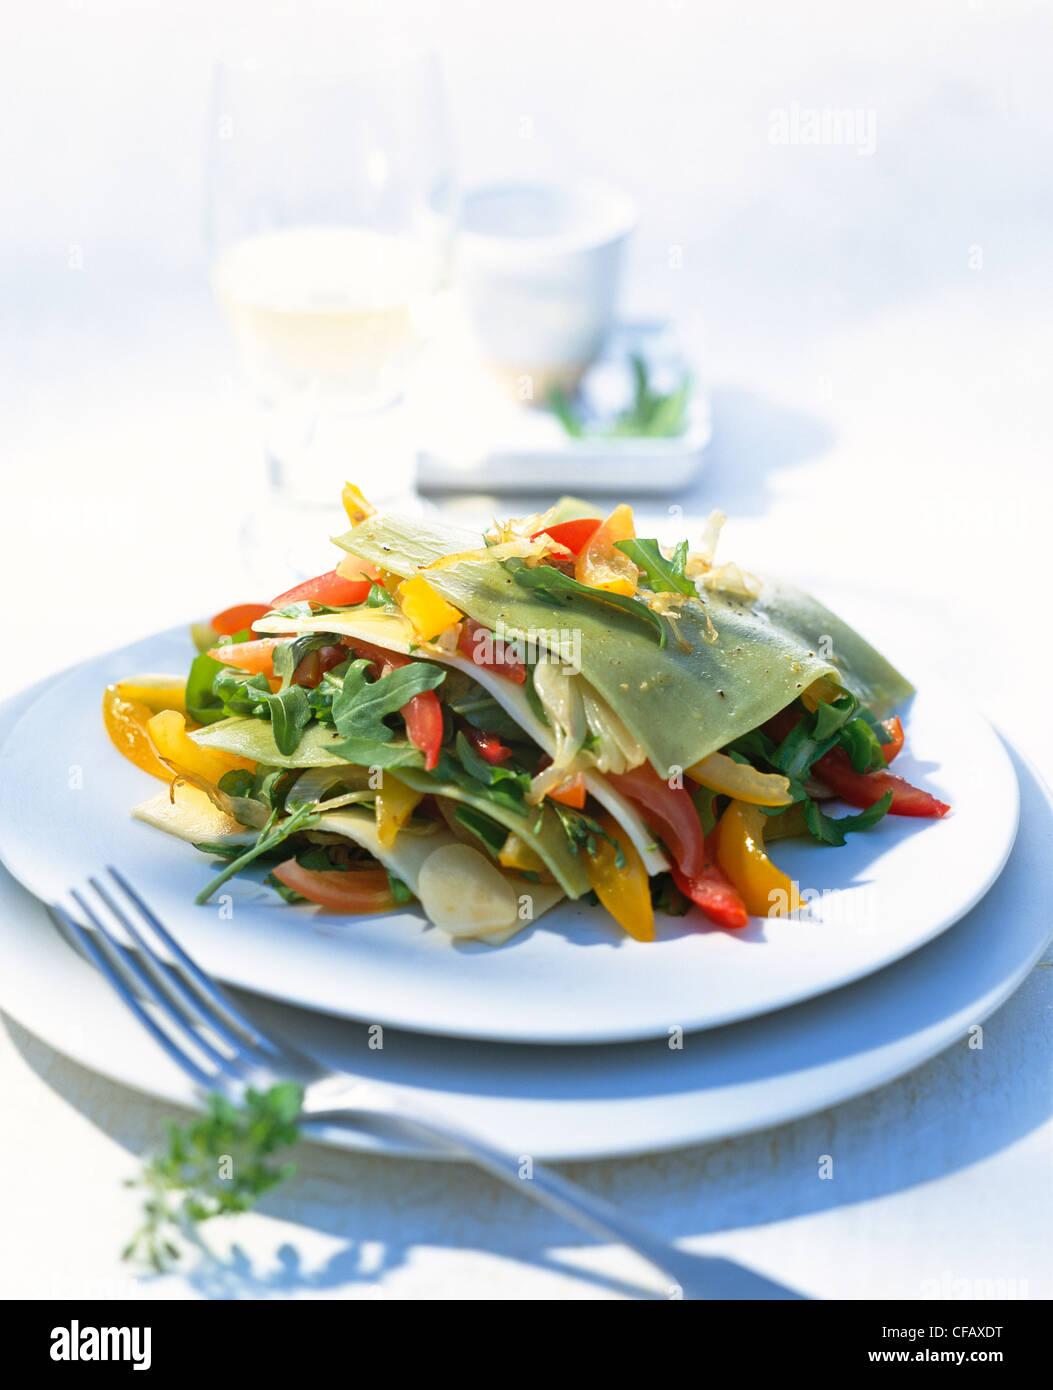 Lasagnes à la salade de tomates fraîches Photo Stock